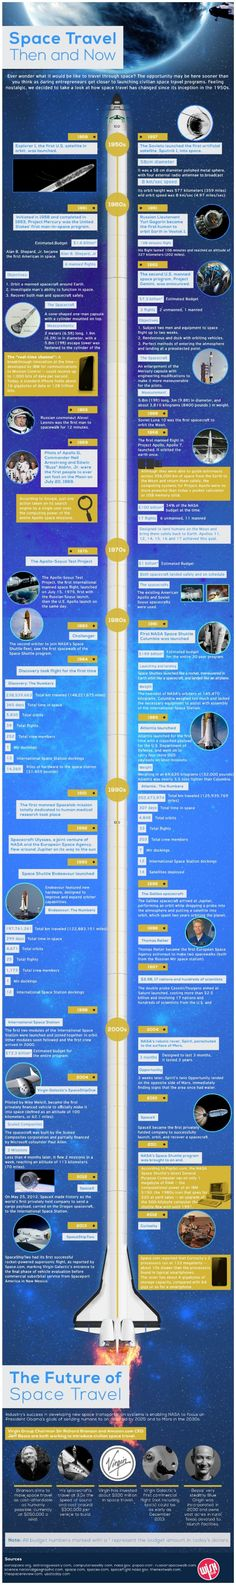 astronomi info, histori infograph, outer space, scienc infograph, travel inforgraph, space infograph, educ, space travel, infograph graph